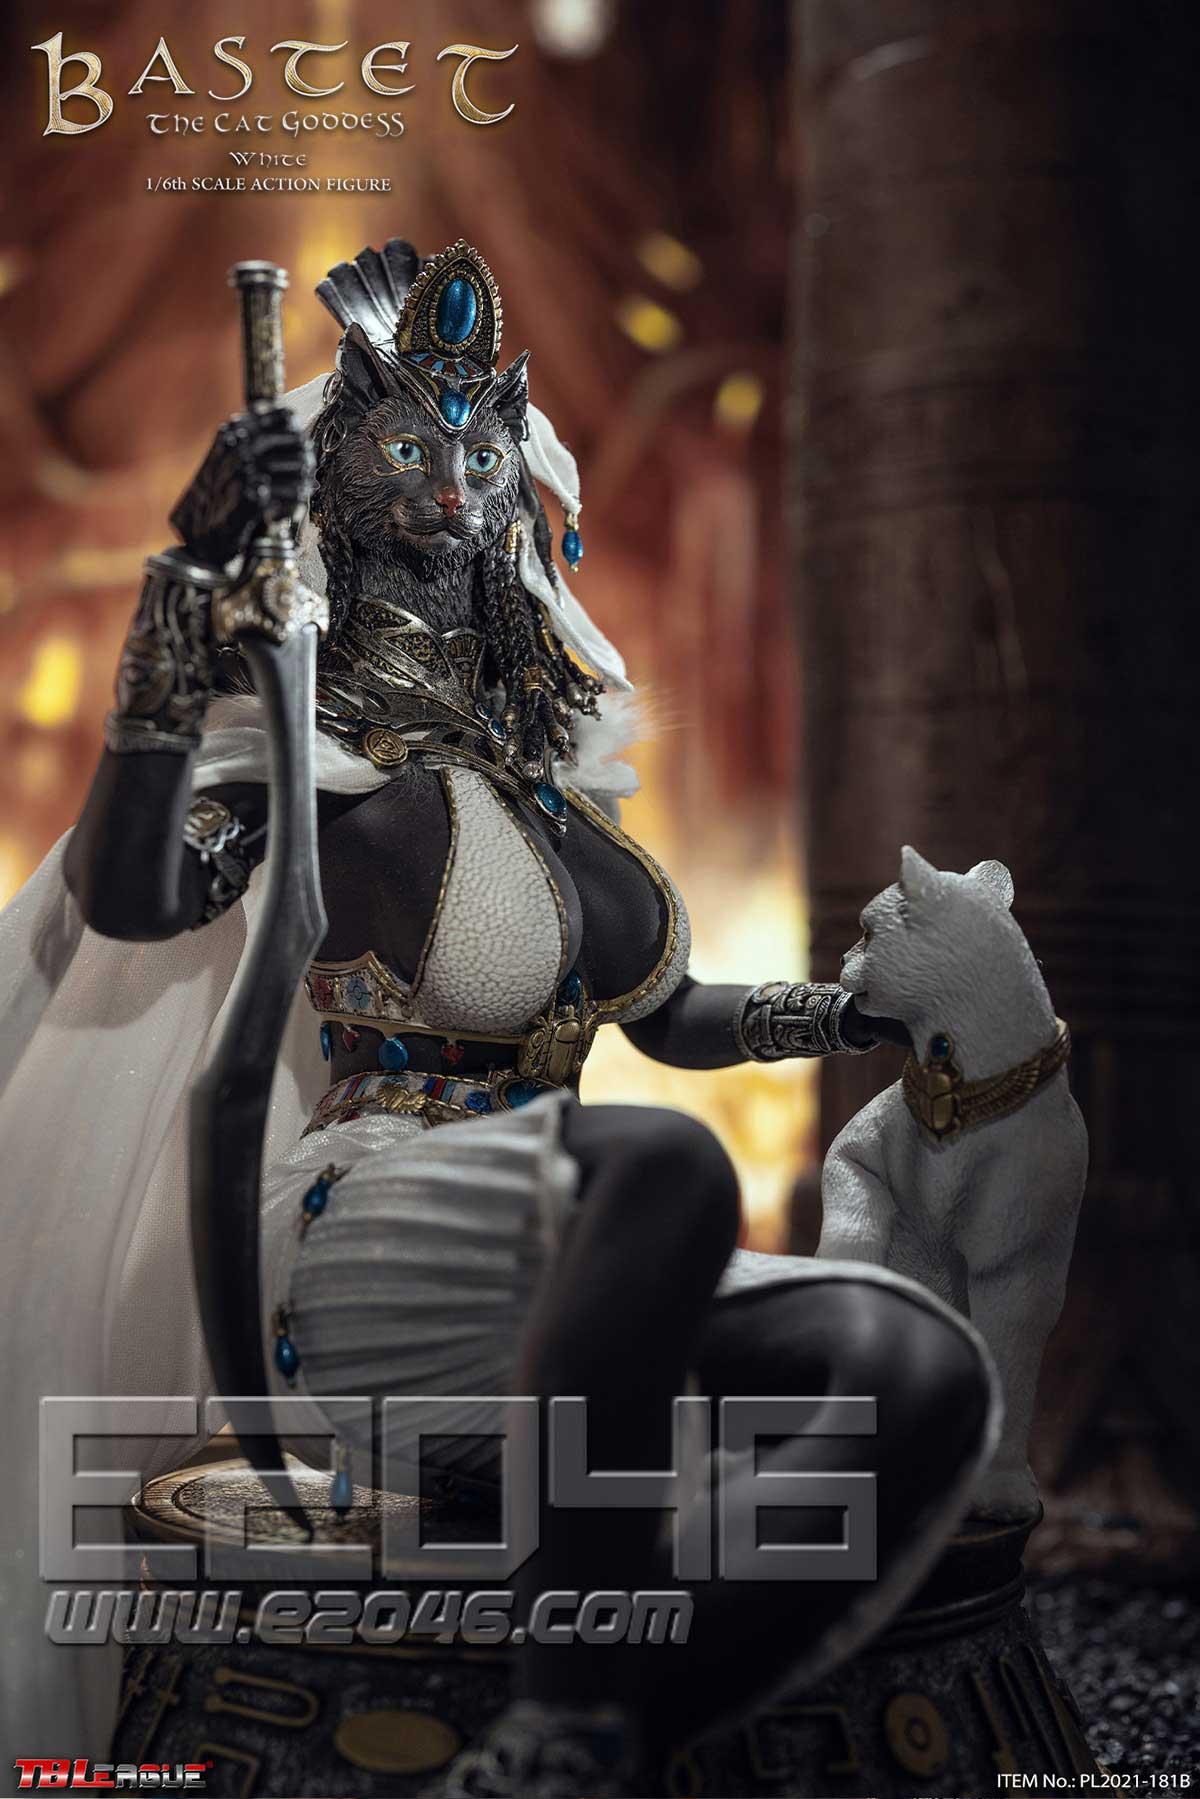 The Cat Goddess Bastet B (DOLL)